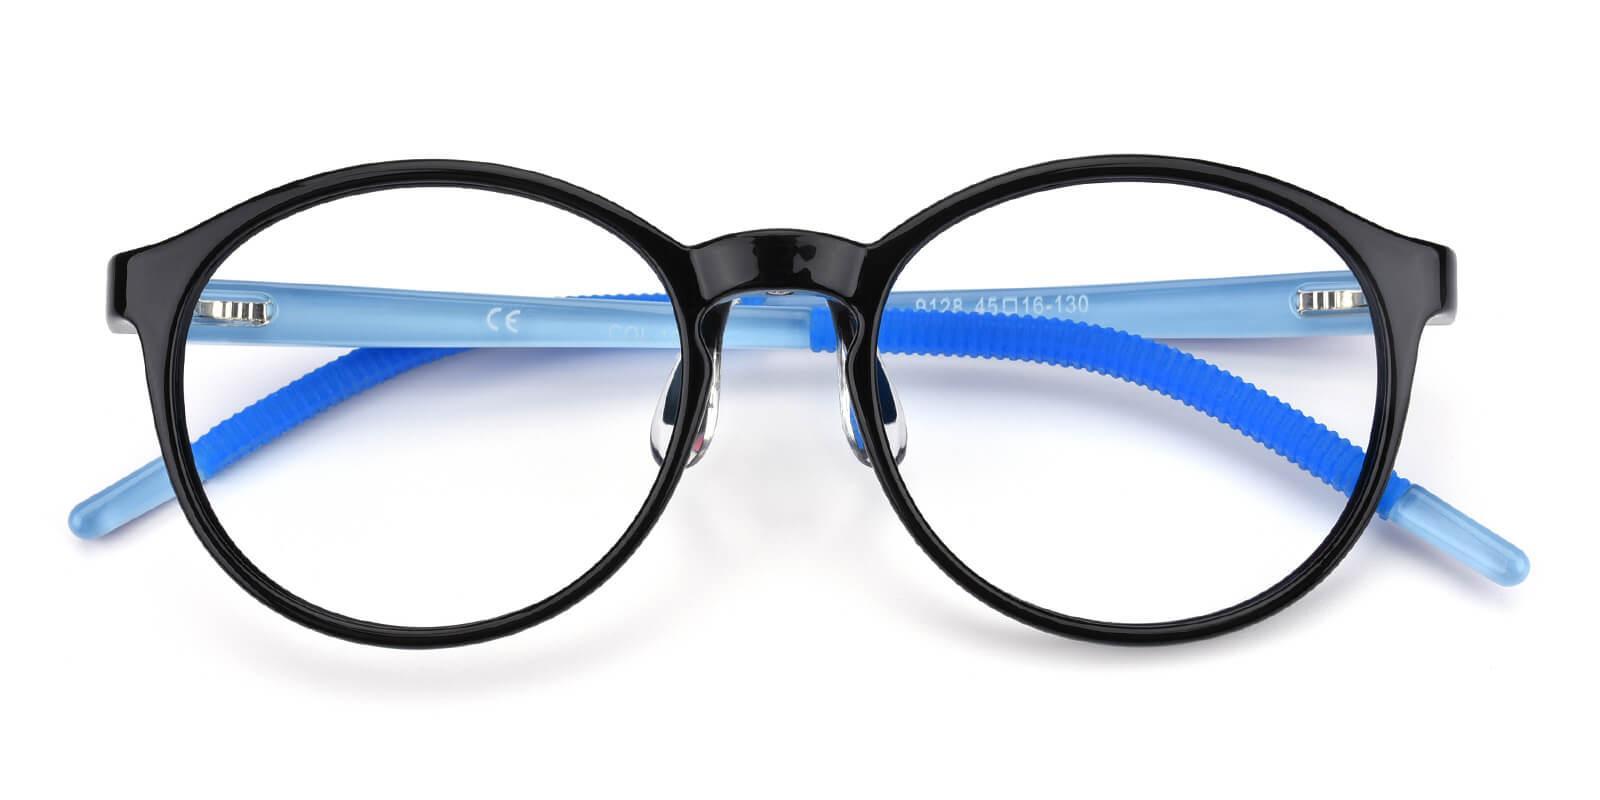 Chigor-Blue-Round-TR-Eyeglasses-detail